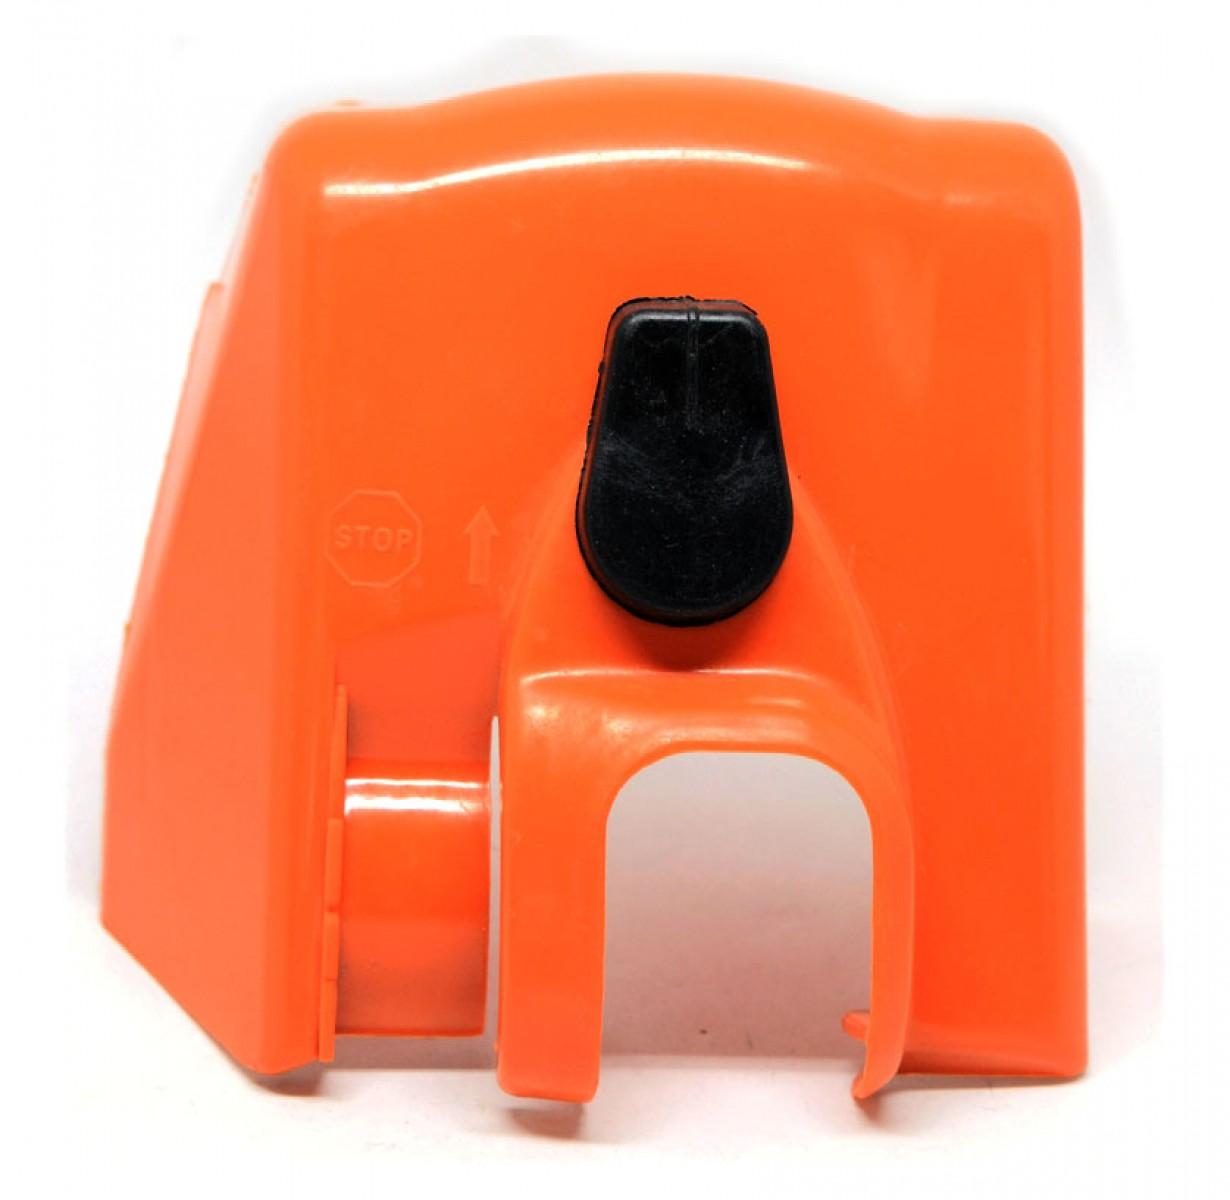 Kryt filtru Stihl MS210 MS230 MS250 023 025